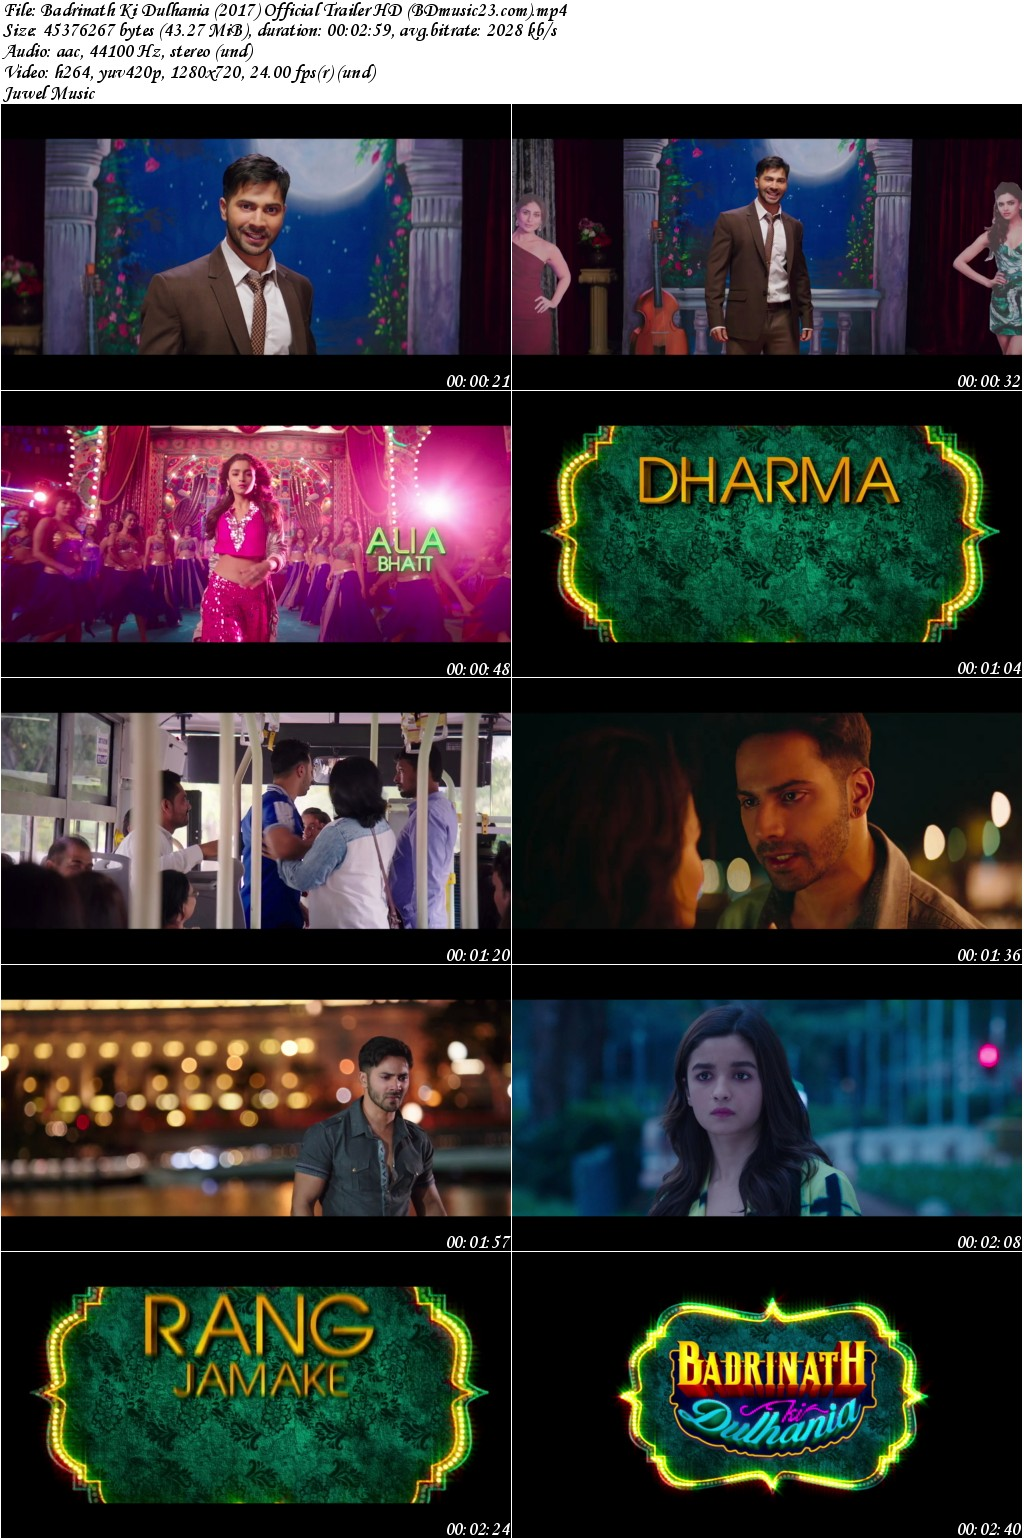 badrinath ki dulhania full movie free download 720p